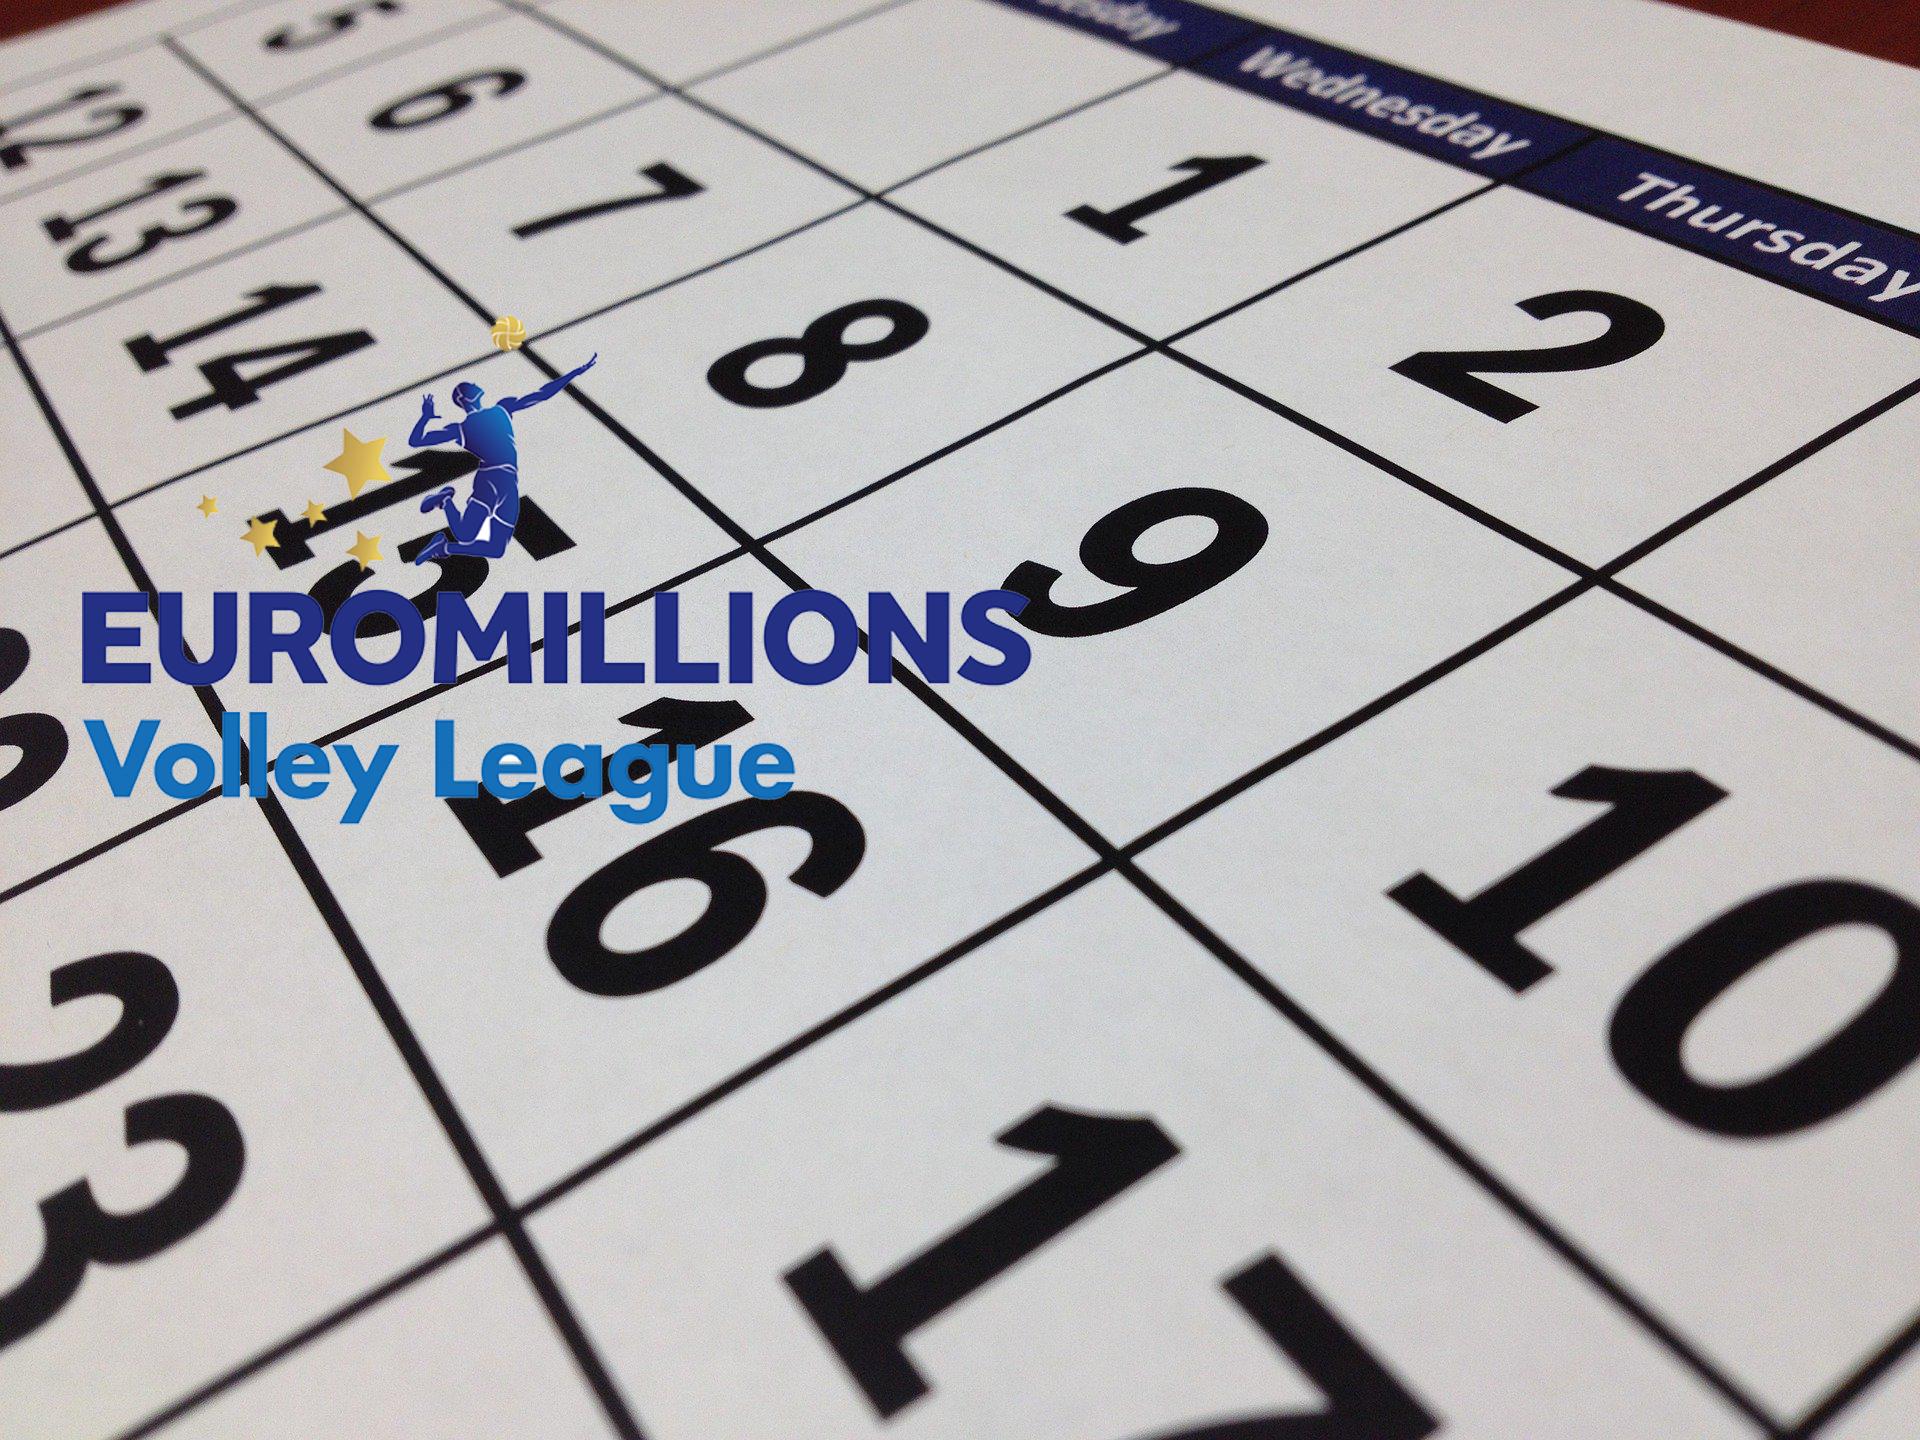 Euromillions Volley League Kalender 2020-202&